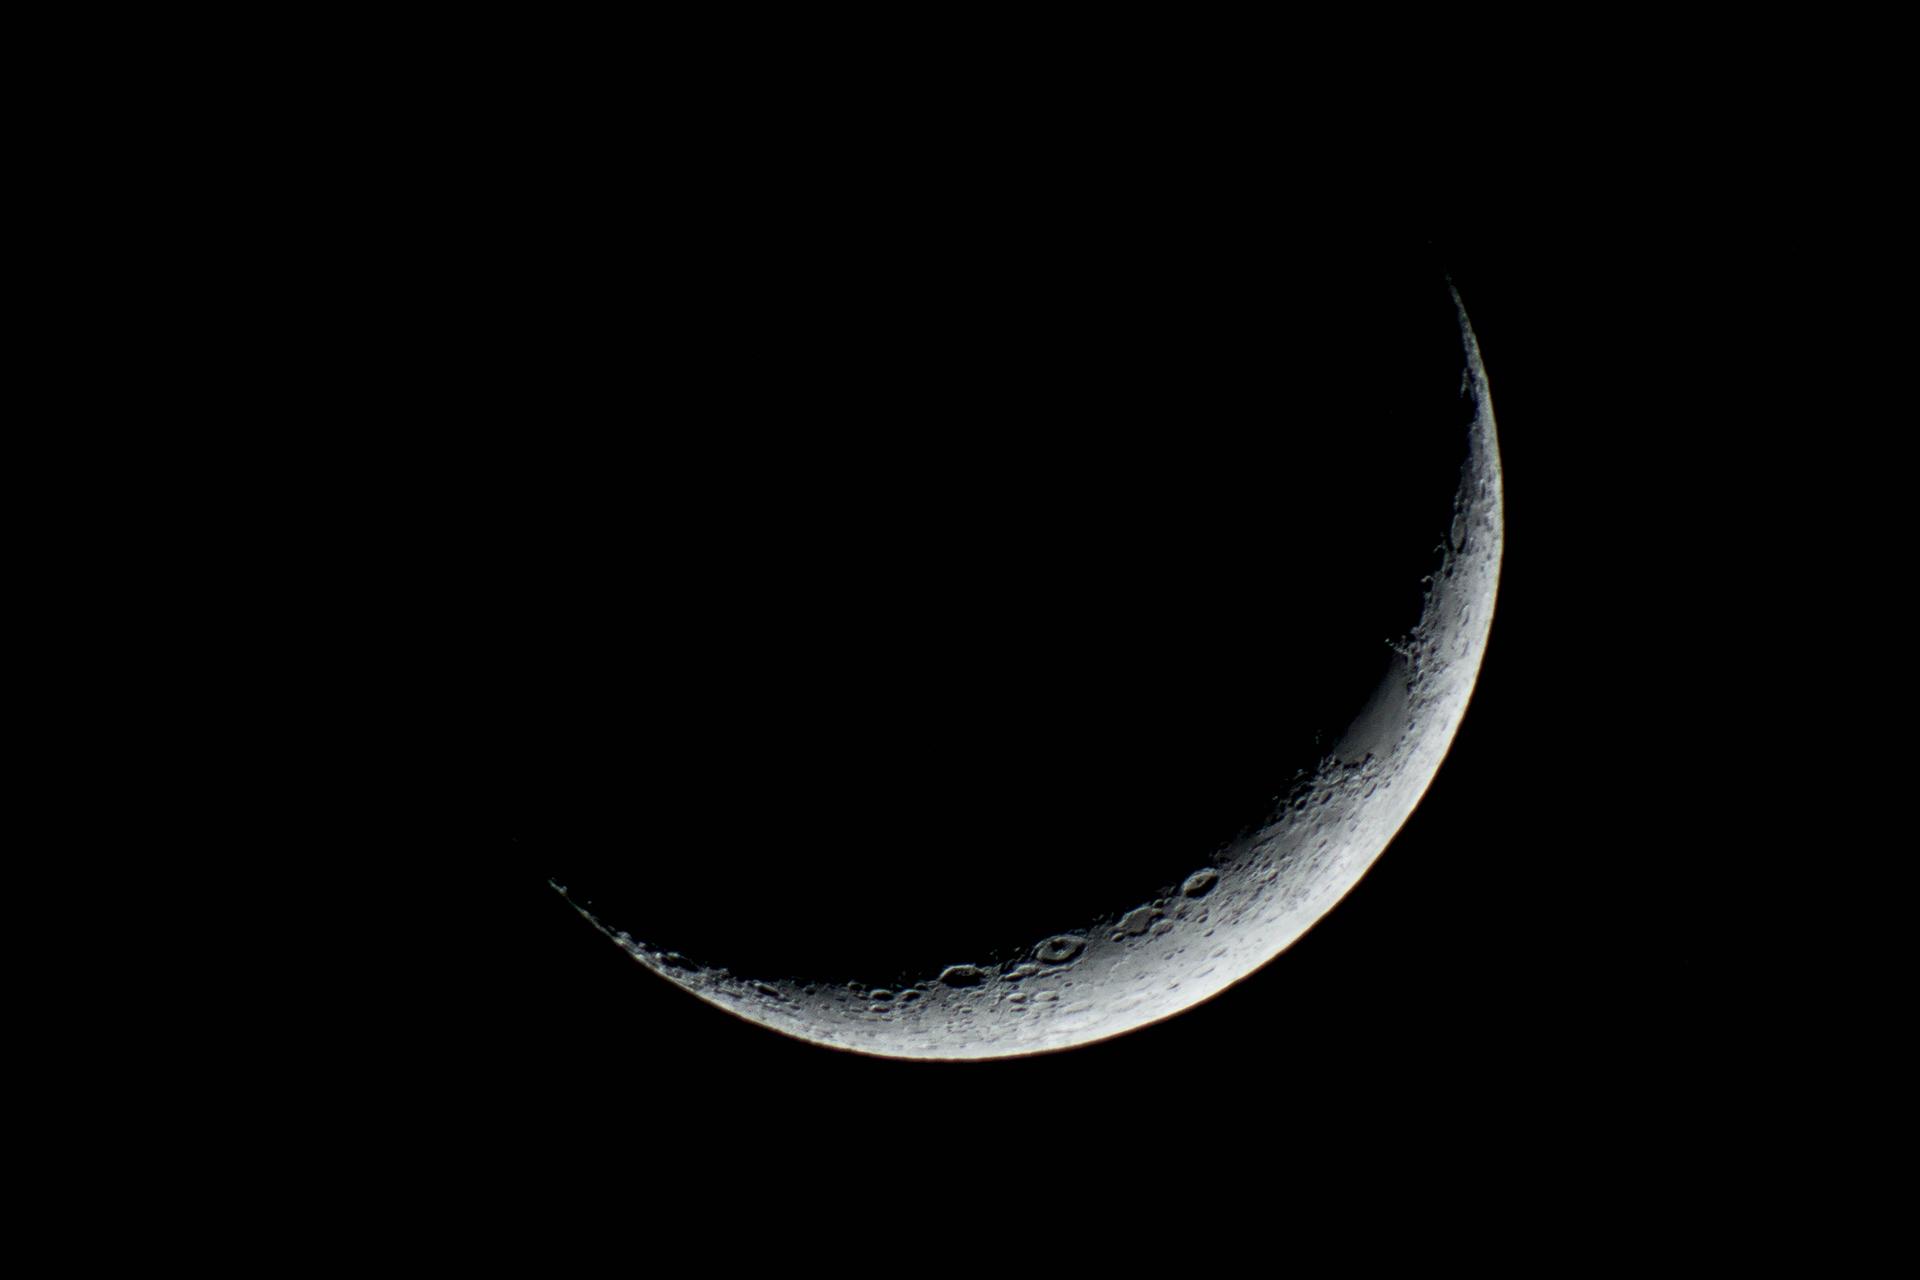 Cresent Moon by Peter Li 2013